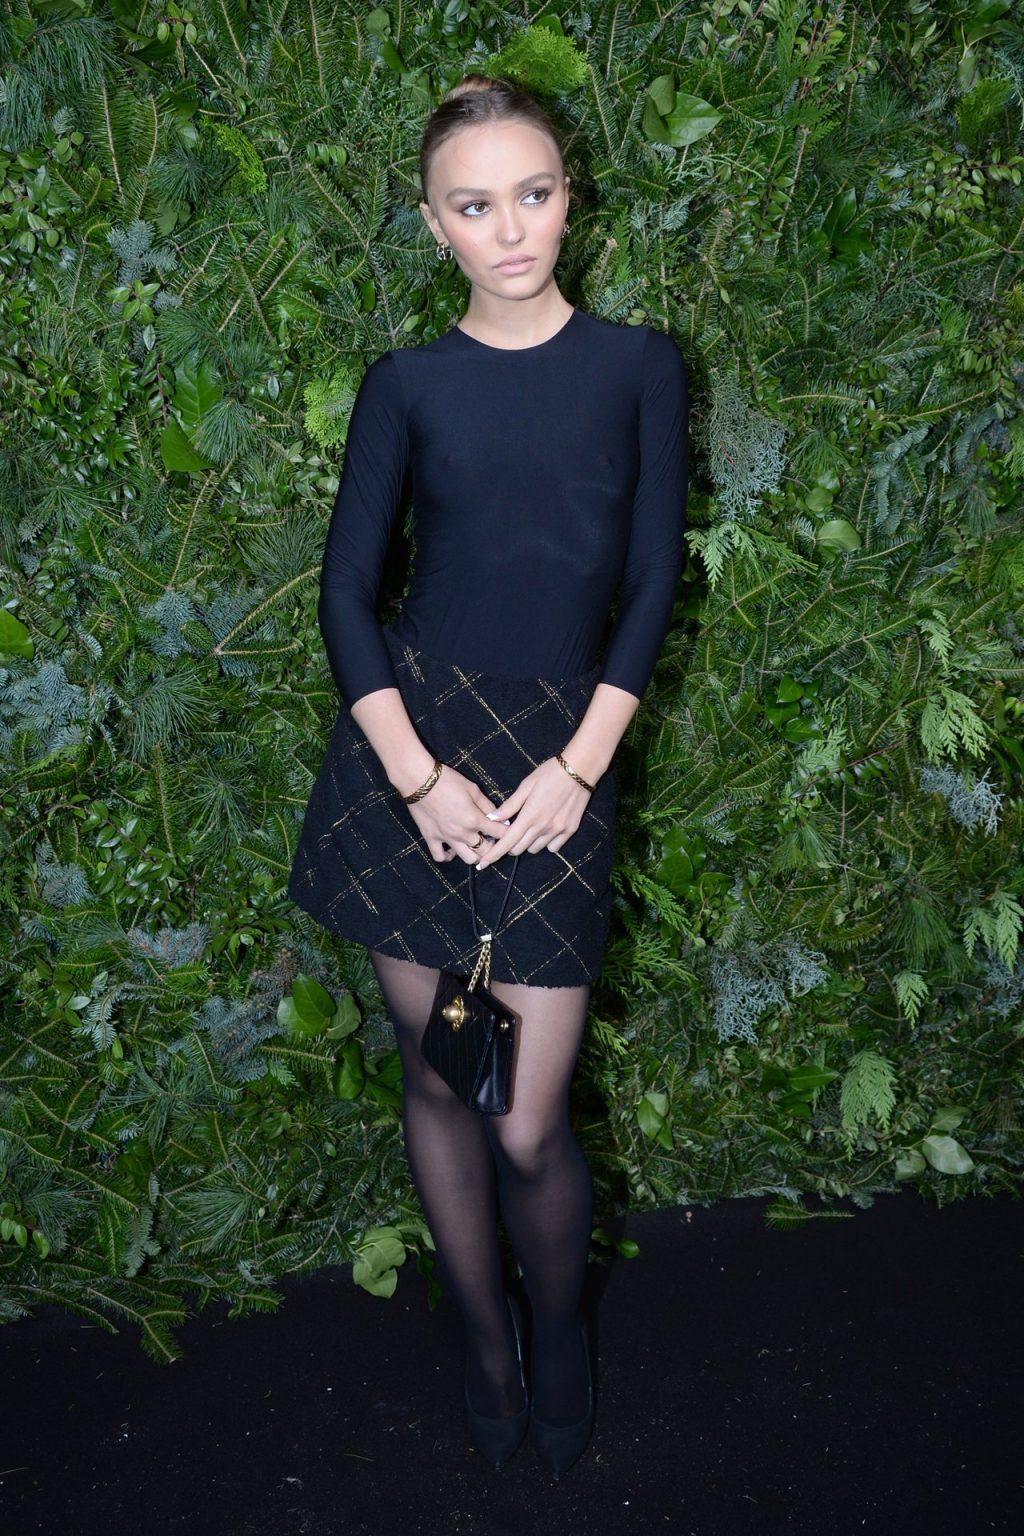 Lily-Rose Depp Braless (68 Photos)